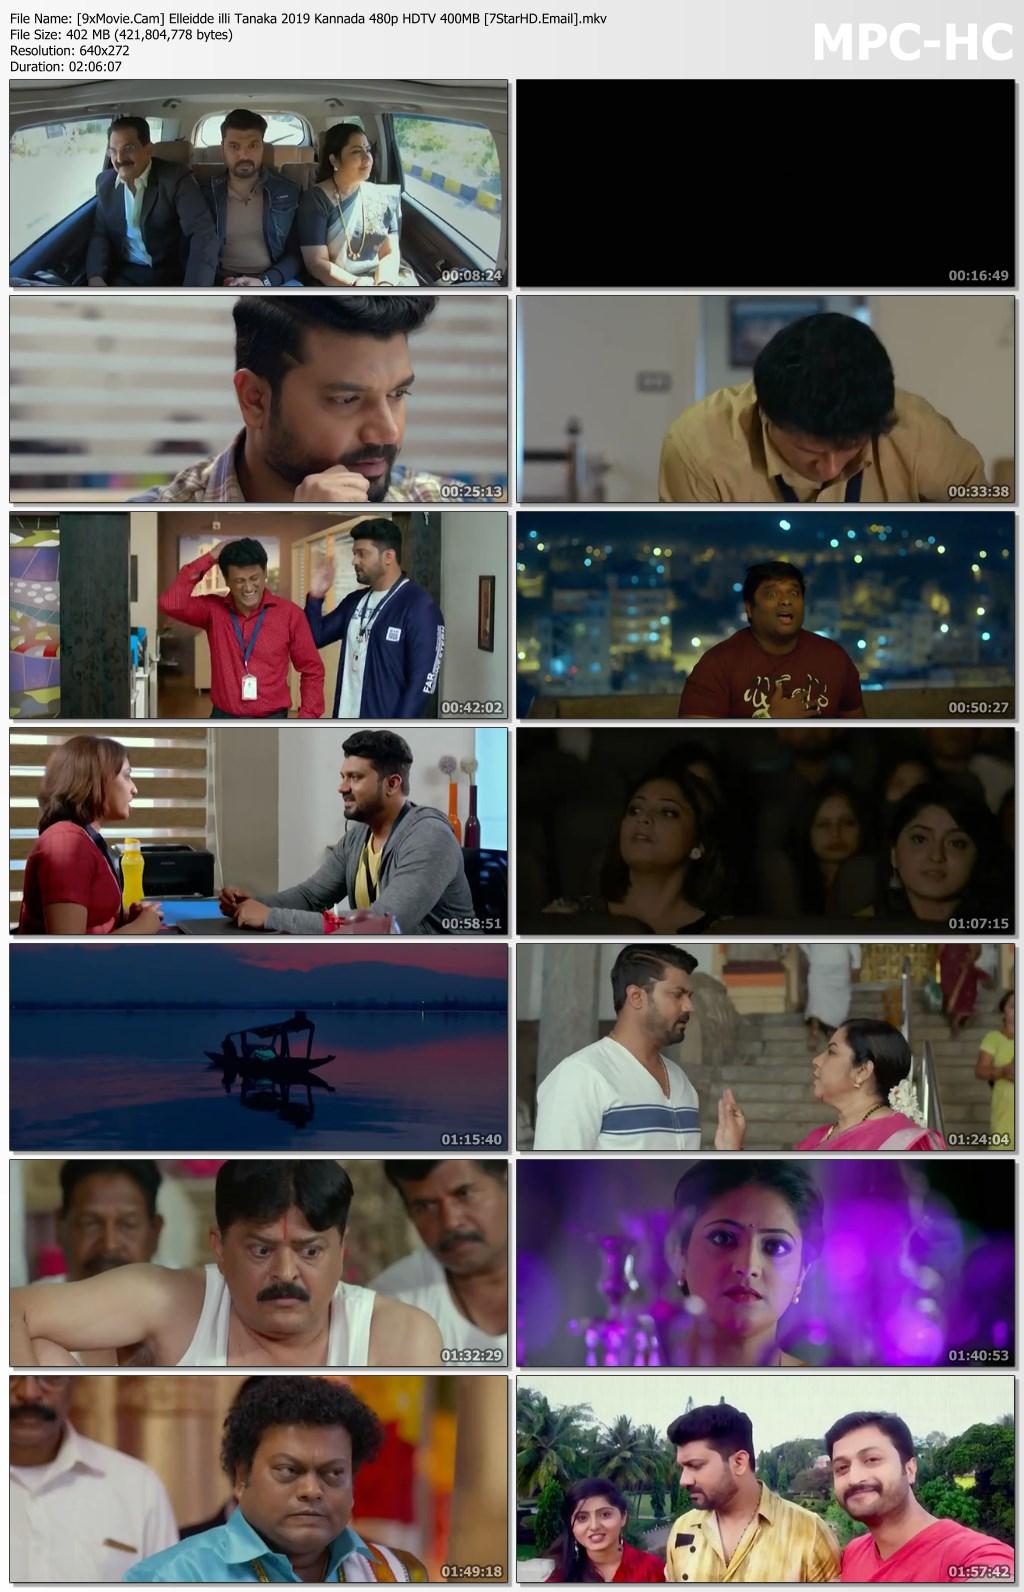 Elleidde illi Tanaka 2019 Kannada 480p HDTV x264 400MB